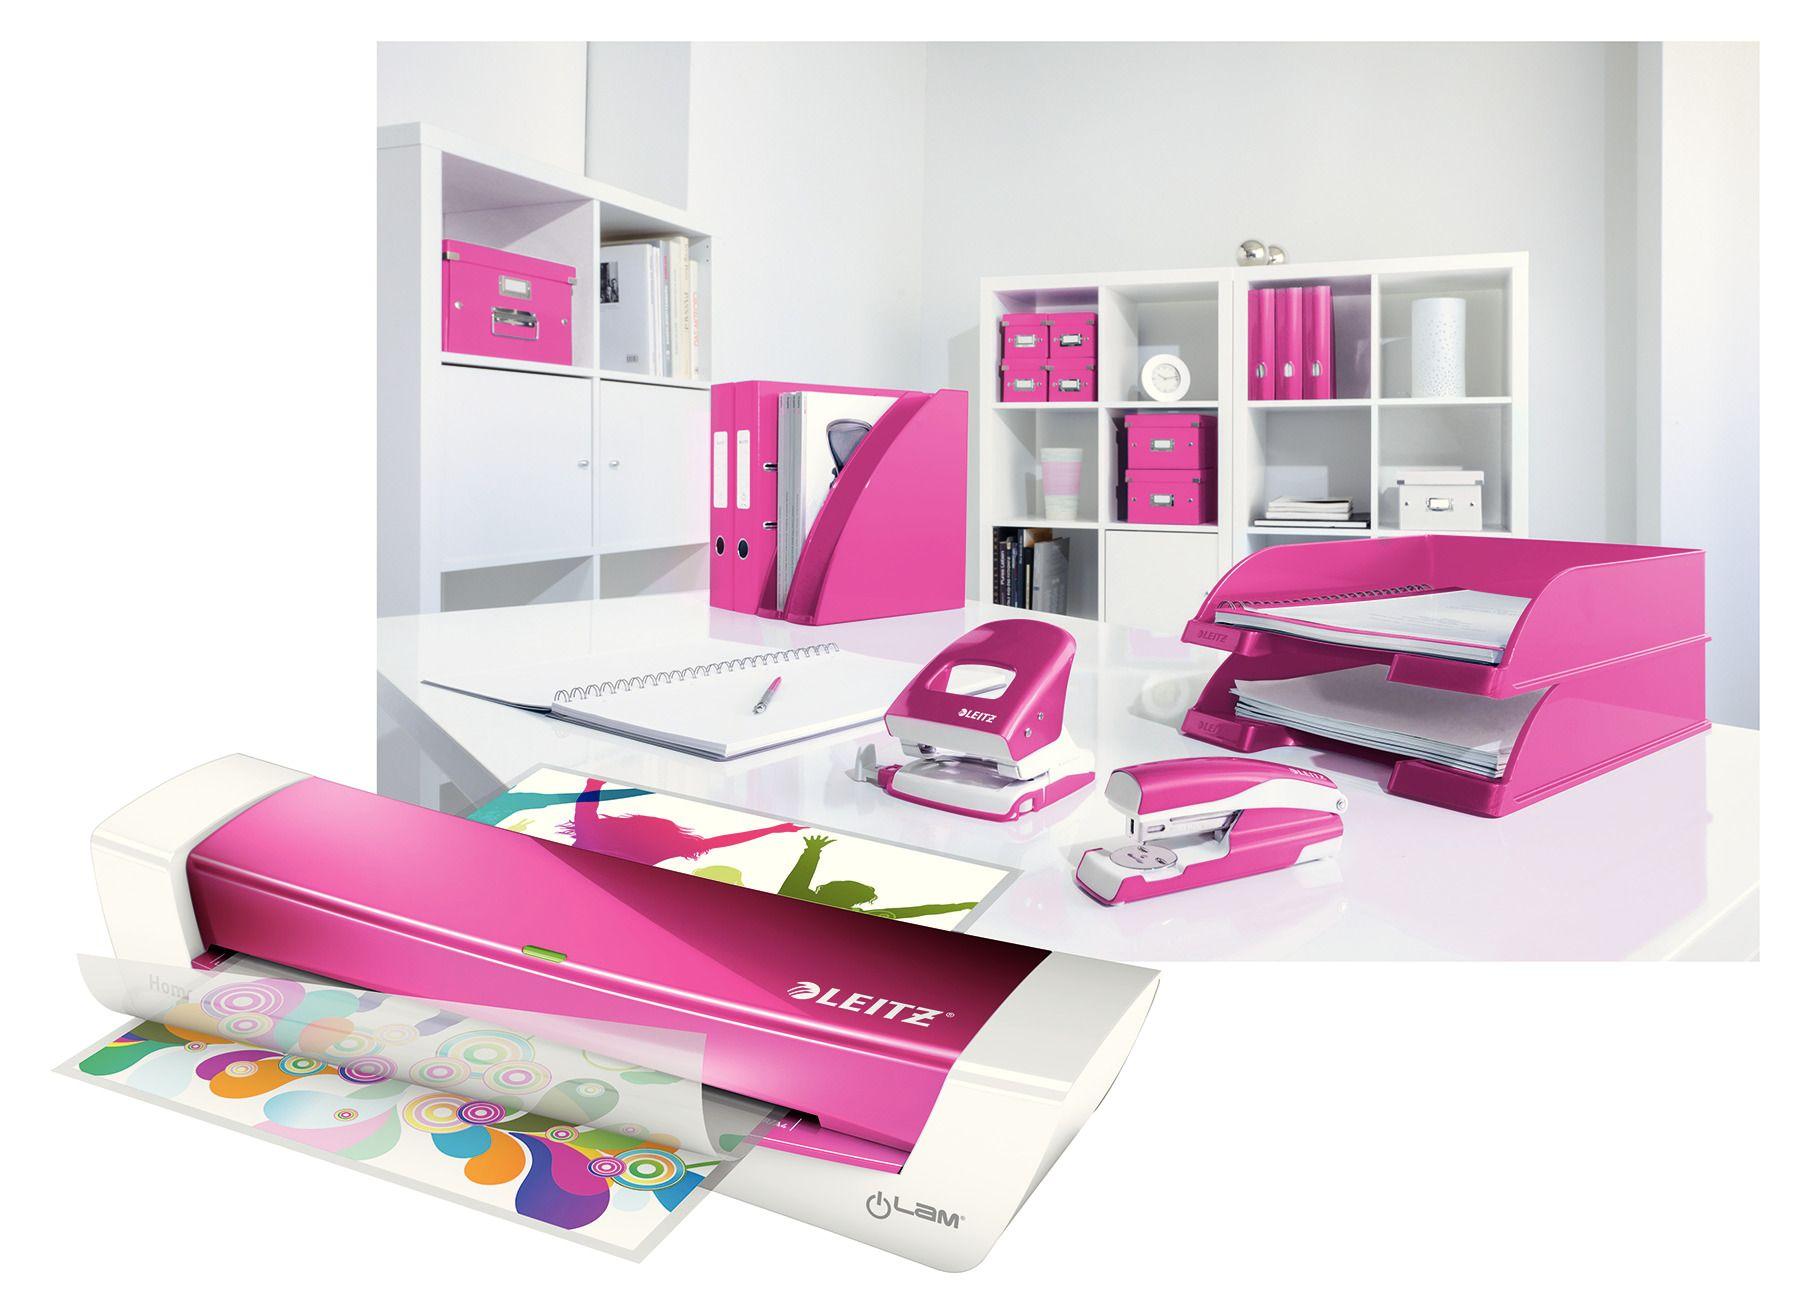 Ламинатор А4 I-lam Home Office, плотность пленки 60 - 125мкм., розов. LEITZ - фото 7